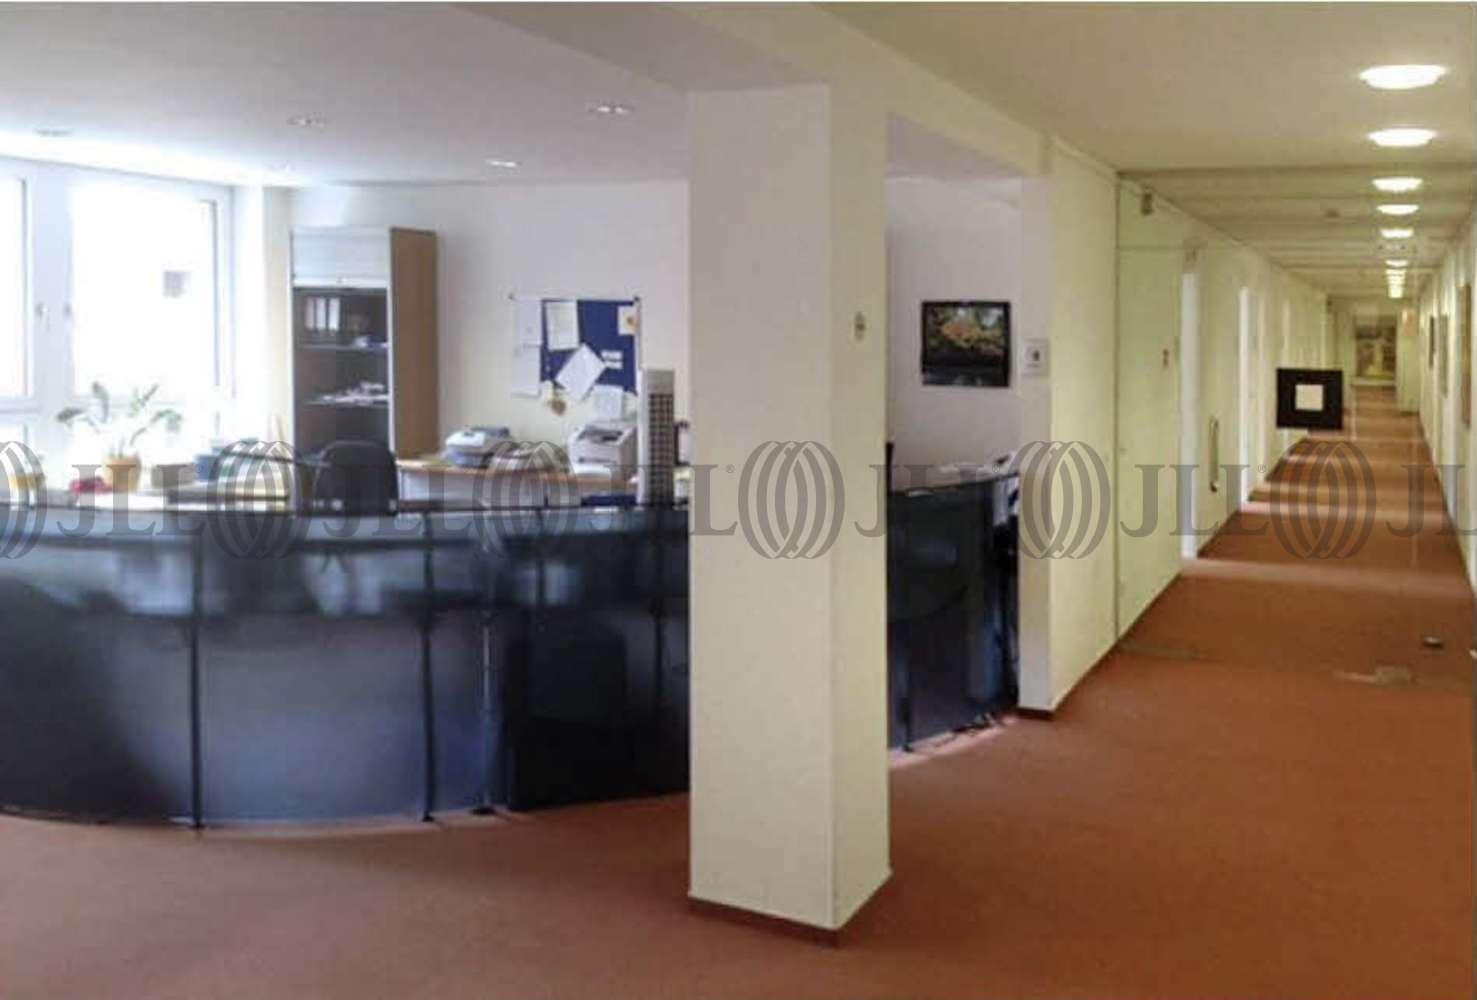 Büros Hamburg, 20354 - Büro - Hamburg, Neustadt - H0540 - 9405572